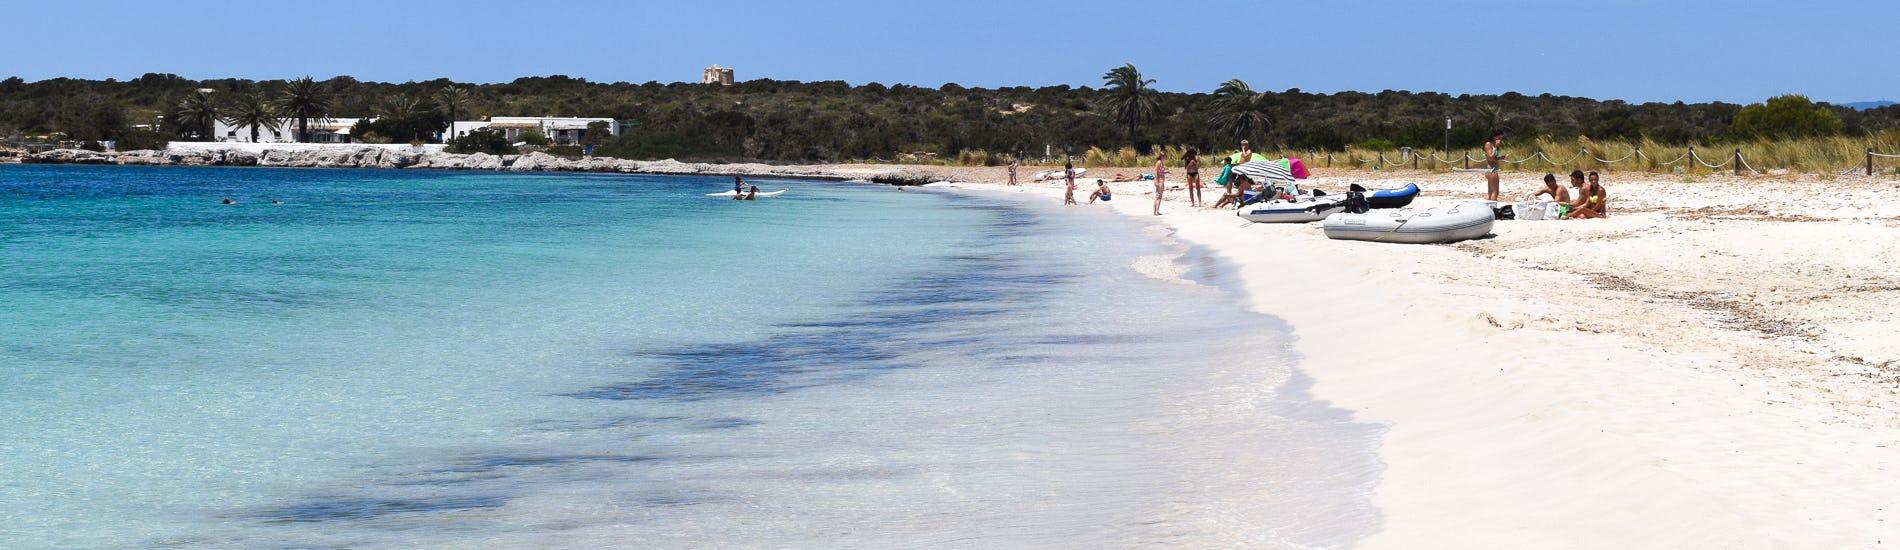 Playa de Espalmador Formentera Pictures, videos & insider tips